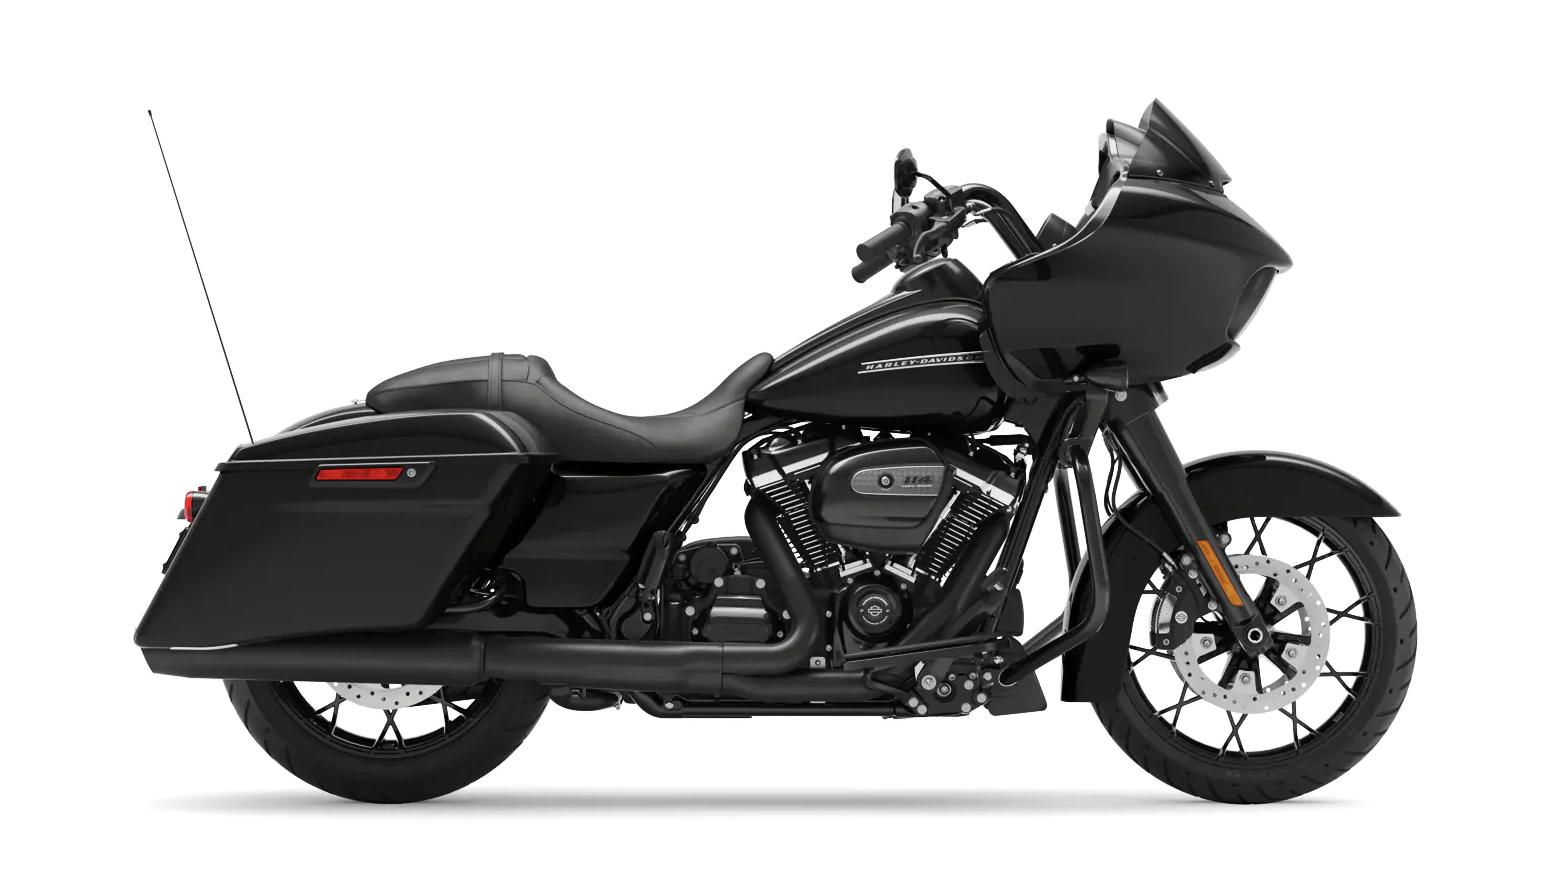 2020 Harley-Davidson Special